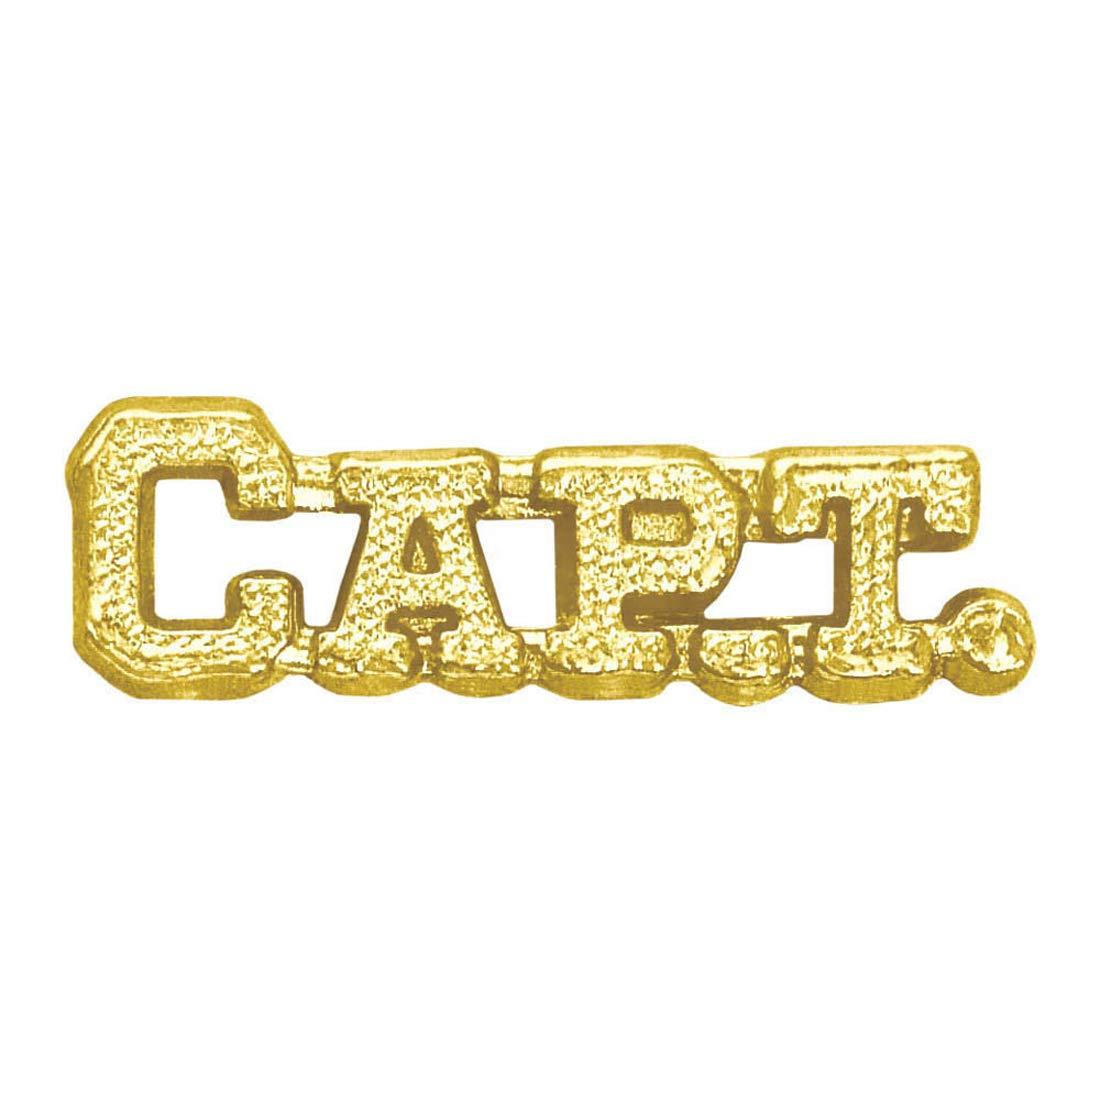 Simba Cal ゴールドキャップ シェニールラペルピン B07NDH4N1G  25